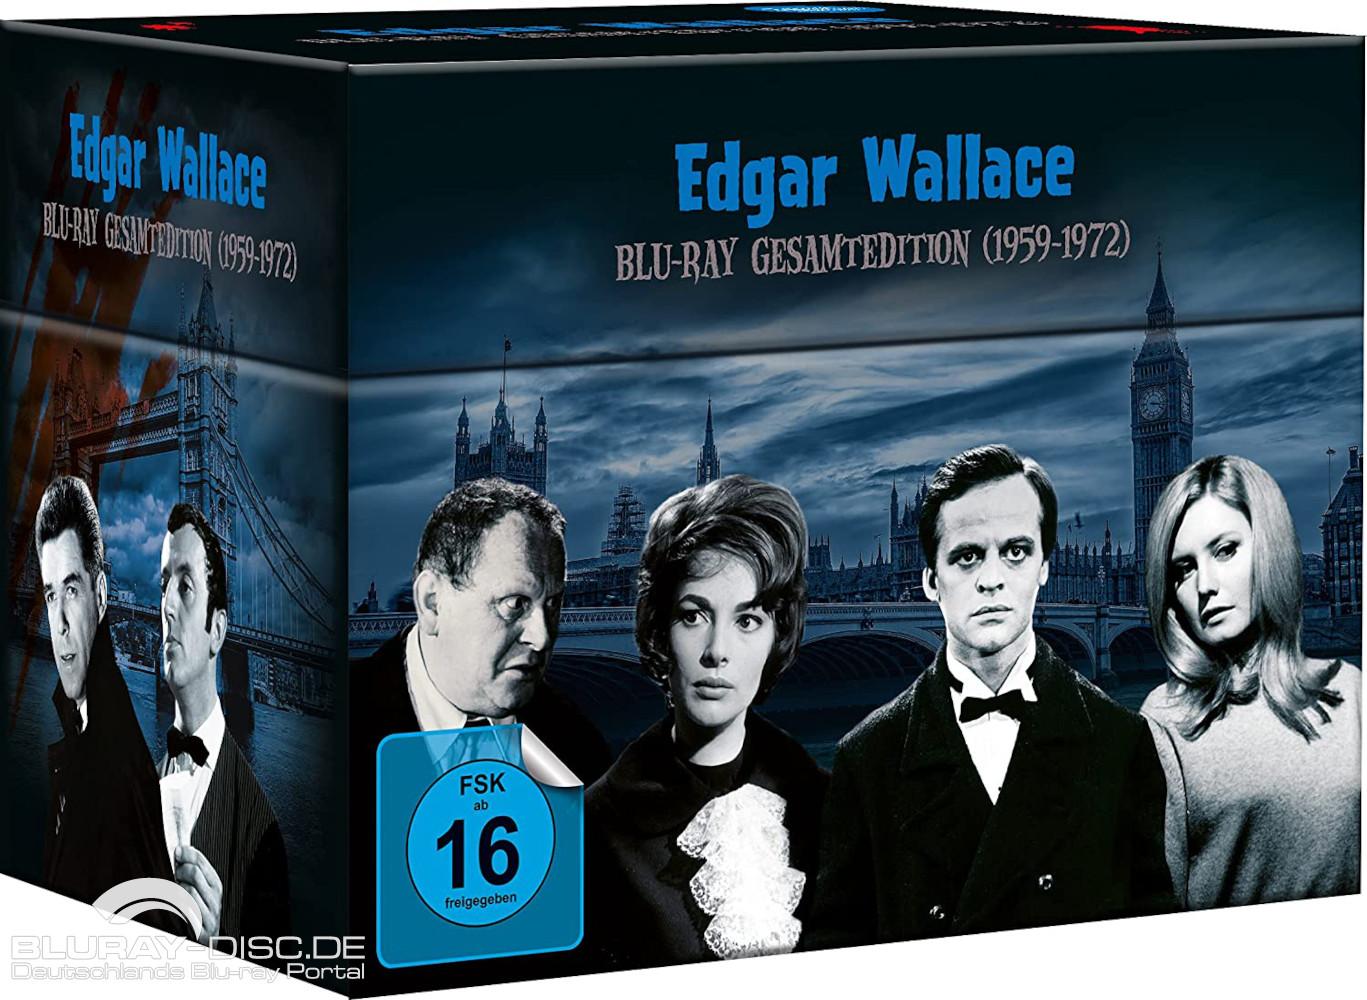 Edgar-Wallace-Gesamtedition-Galerie-01.jpg